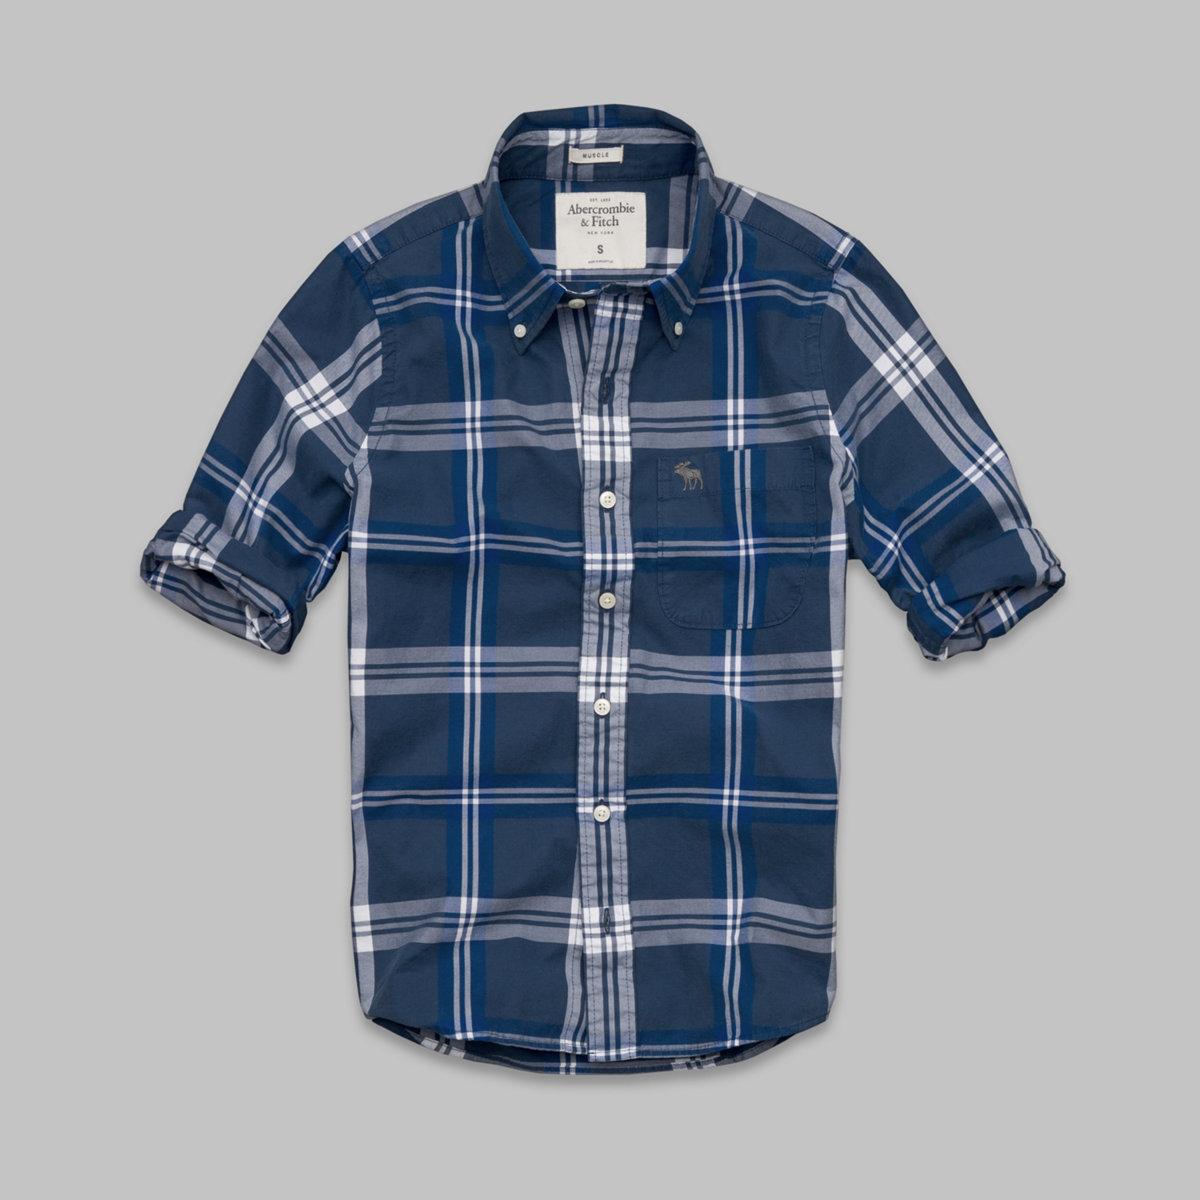 Noonmark Shirt